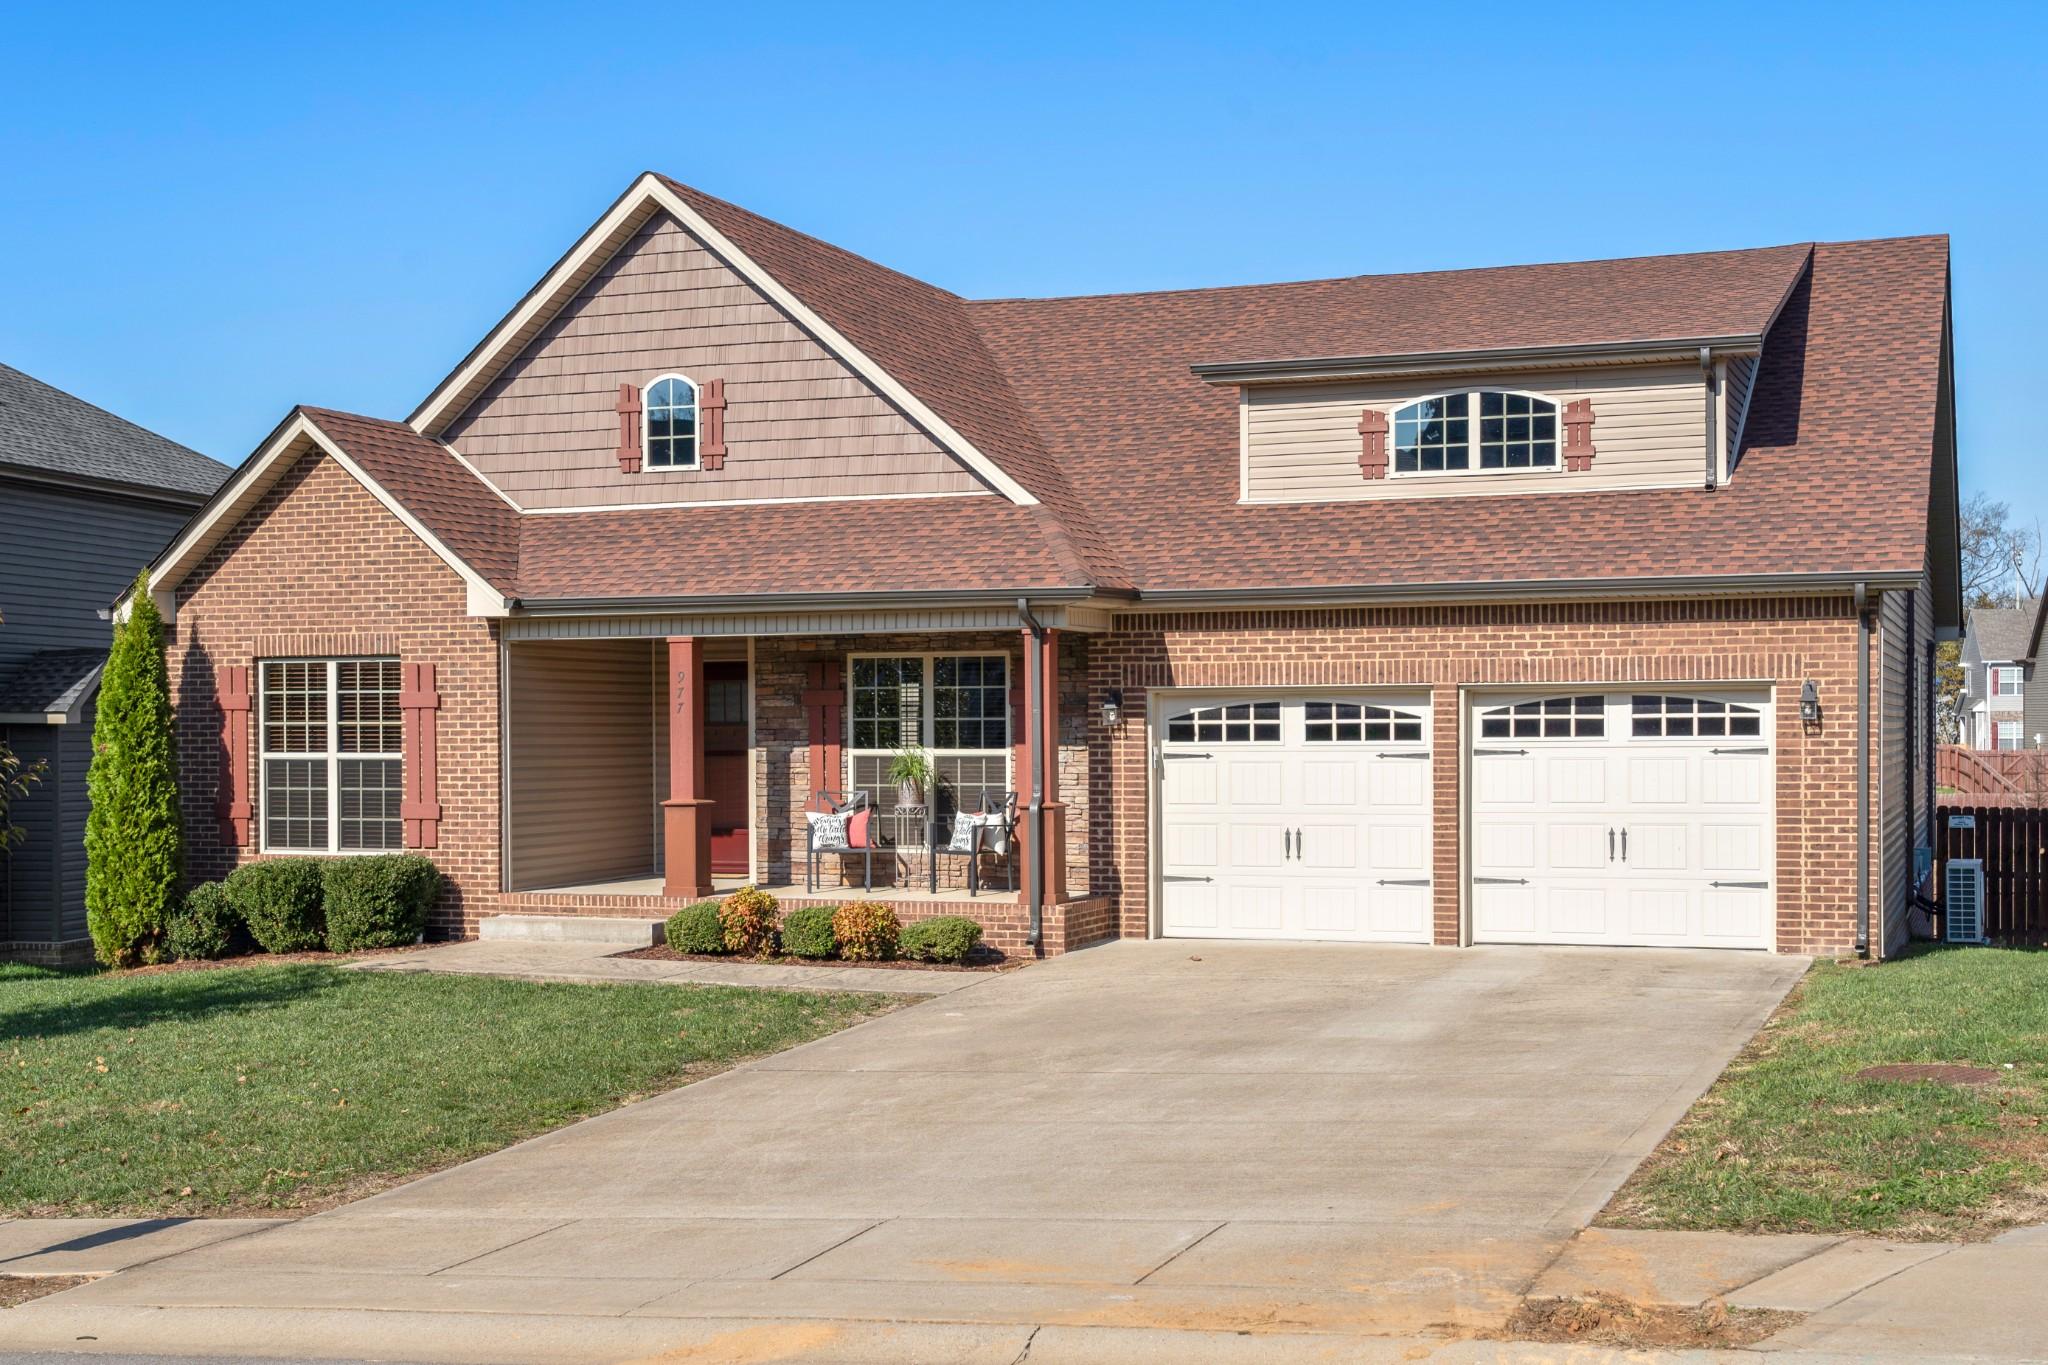 977 Bonellis Lane, Clarksville, TN 37040 | Compass